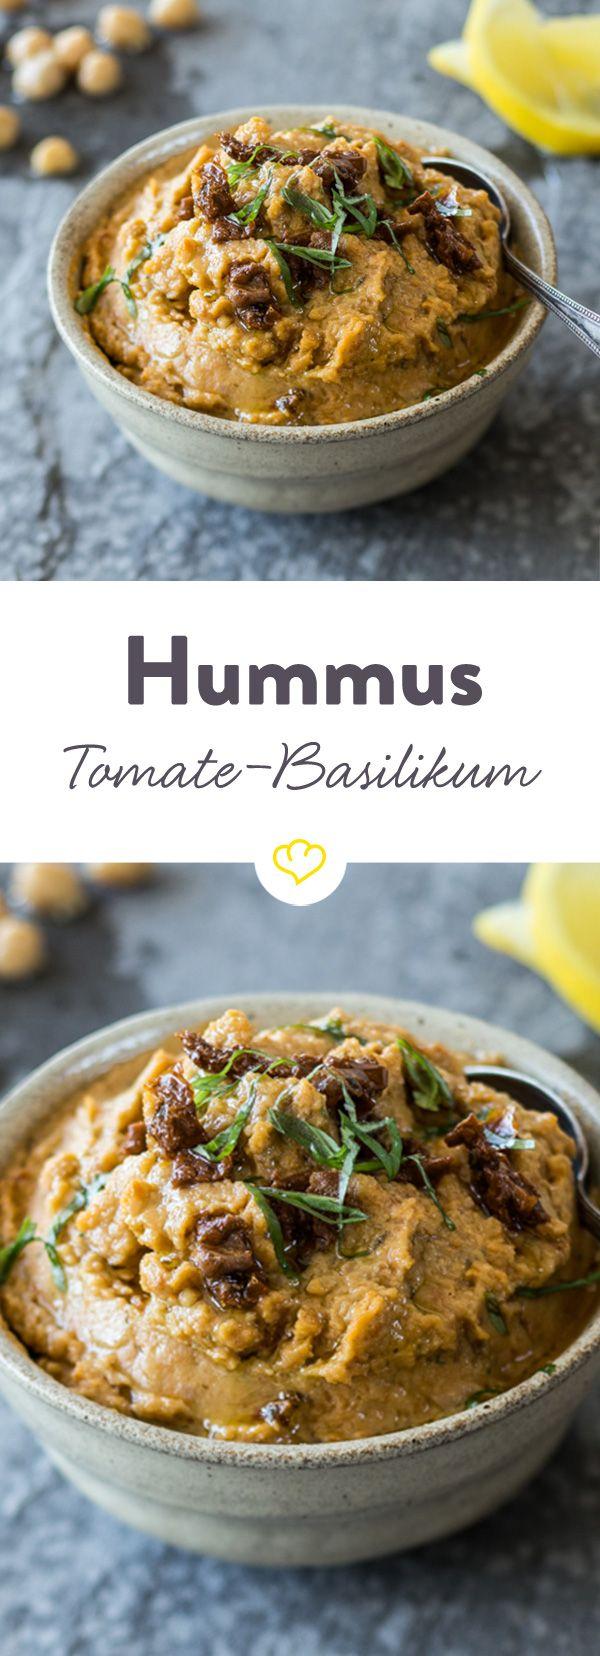 tomaten basilikum hummus rezept dip dip hurra. Black Bedroom Furniture Sets. Home Design Ideas